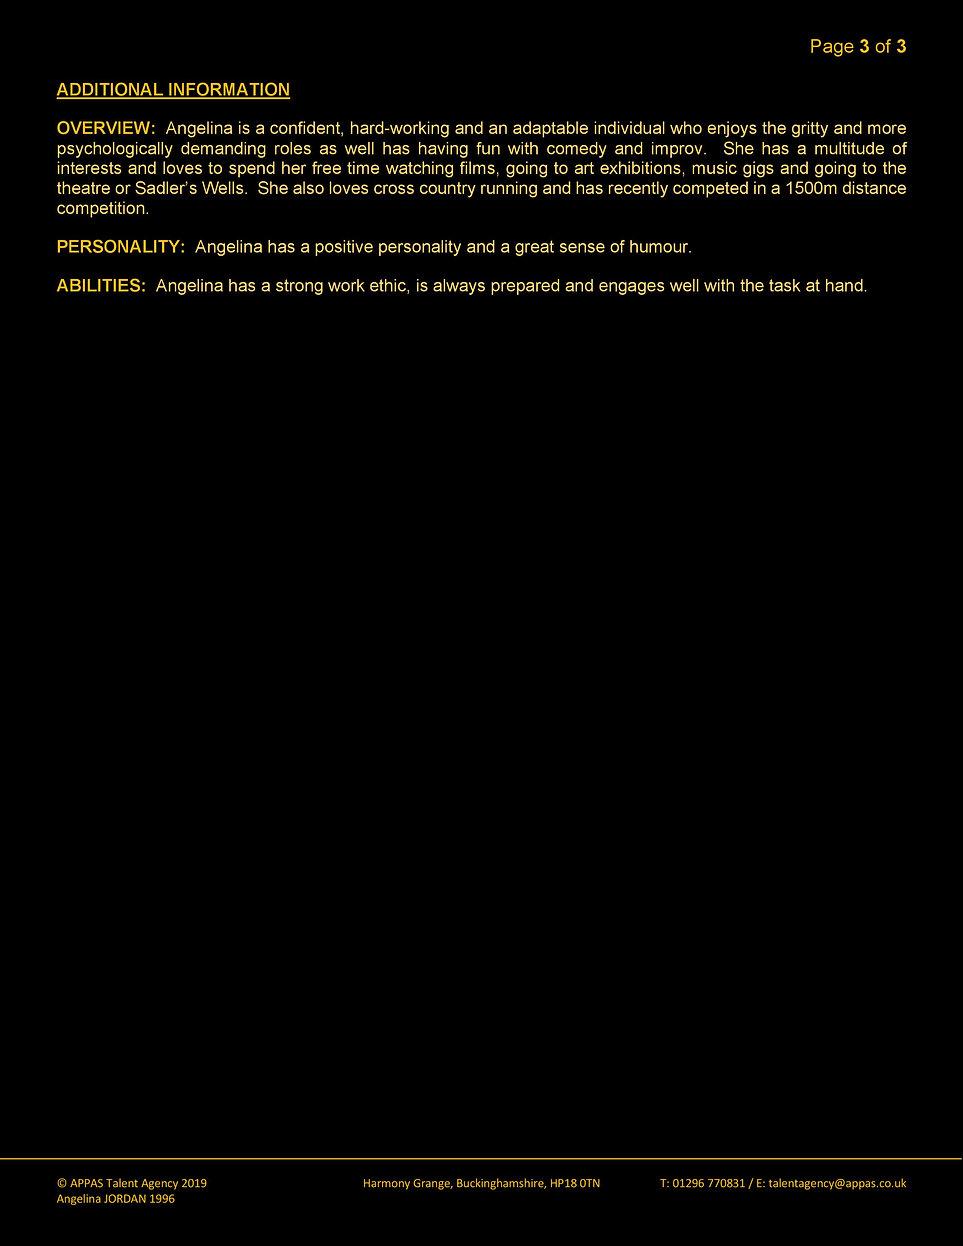 ANGELINA JORDAN WEB CV (DEC 2019) 3.jpg